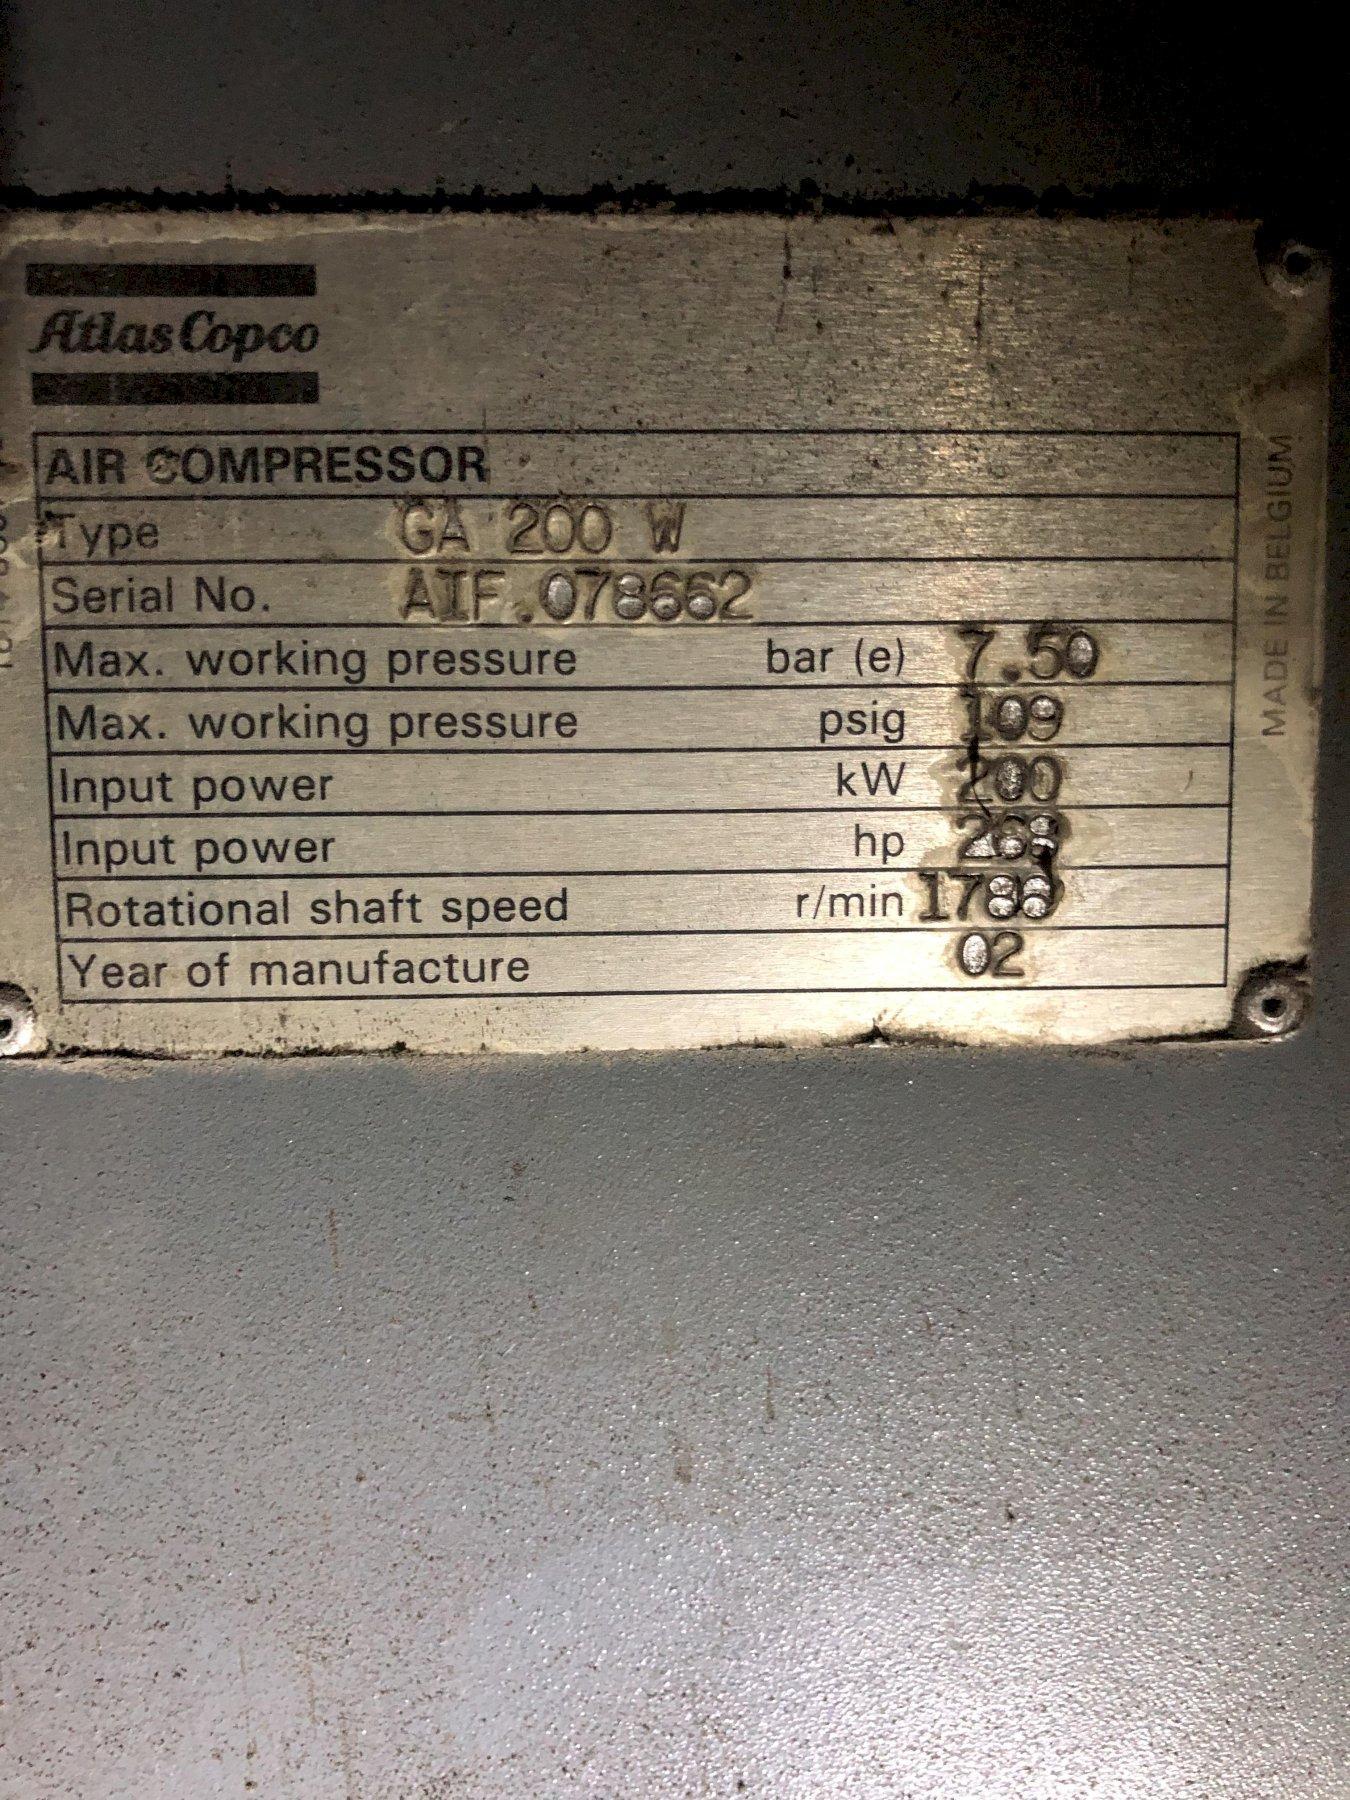 2002 Atlas Copco model ga200w 268 hp screw type air compressor s/n aif.078662